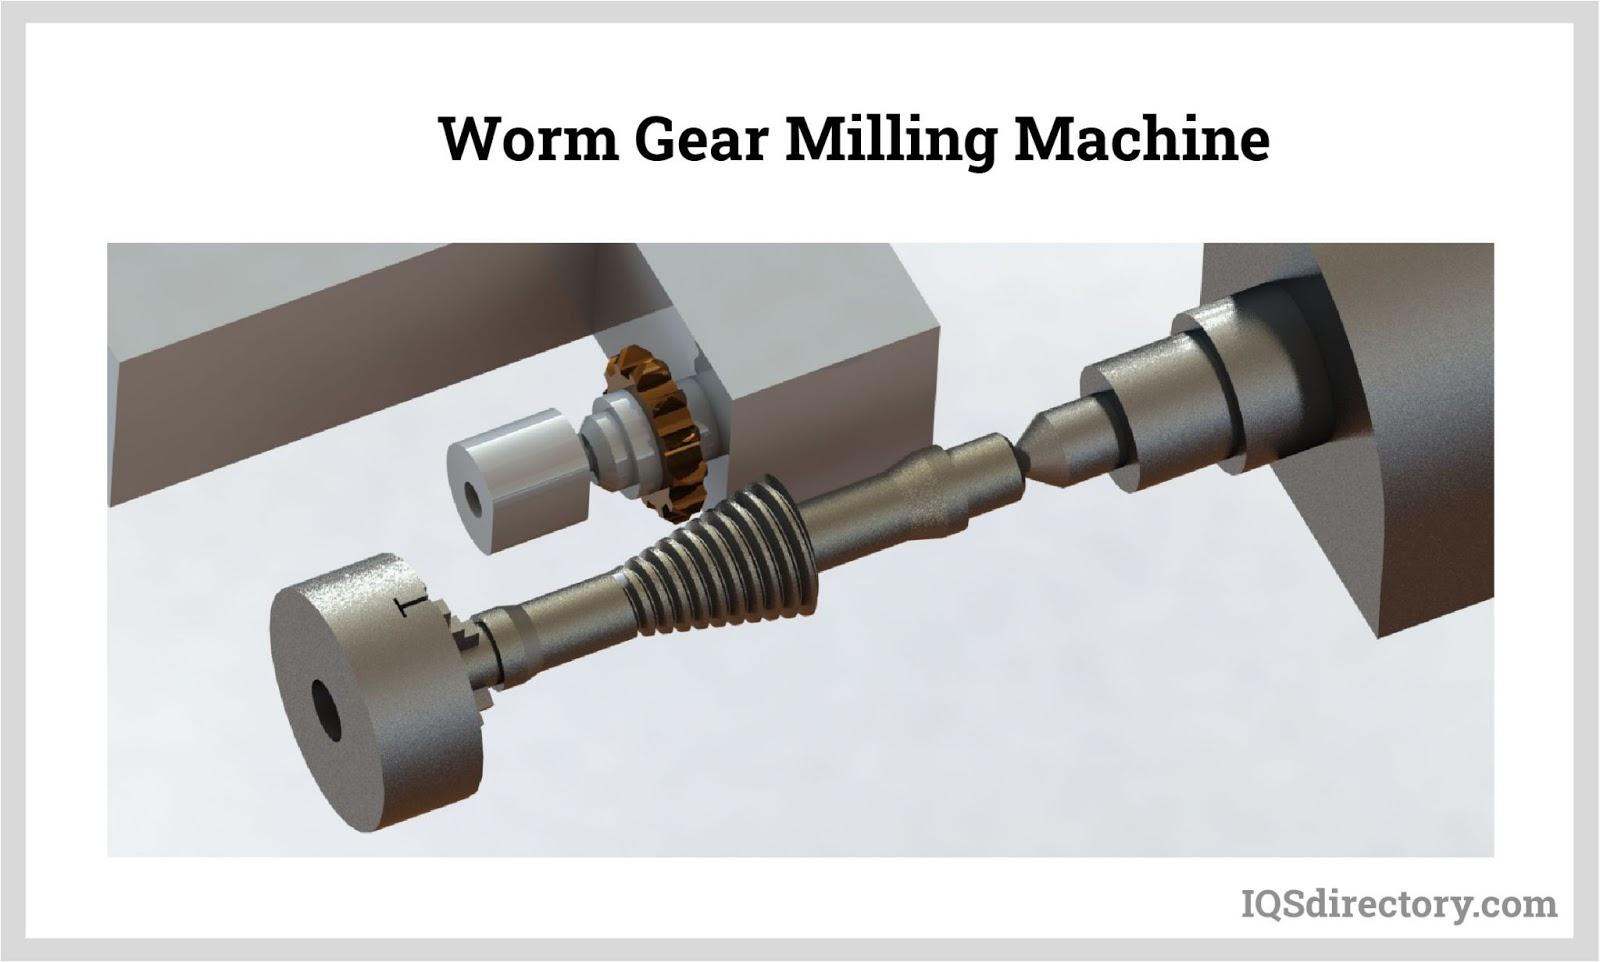 Worm Gear Milling Machine